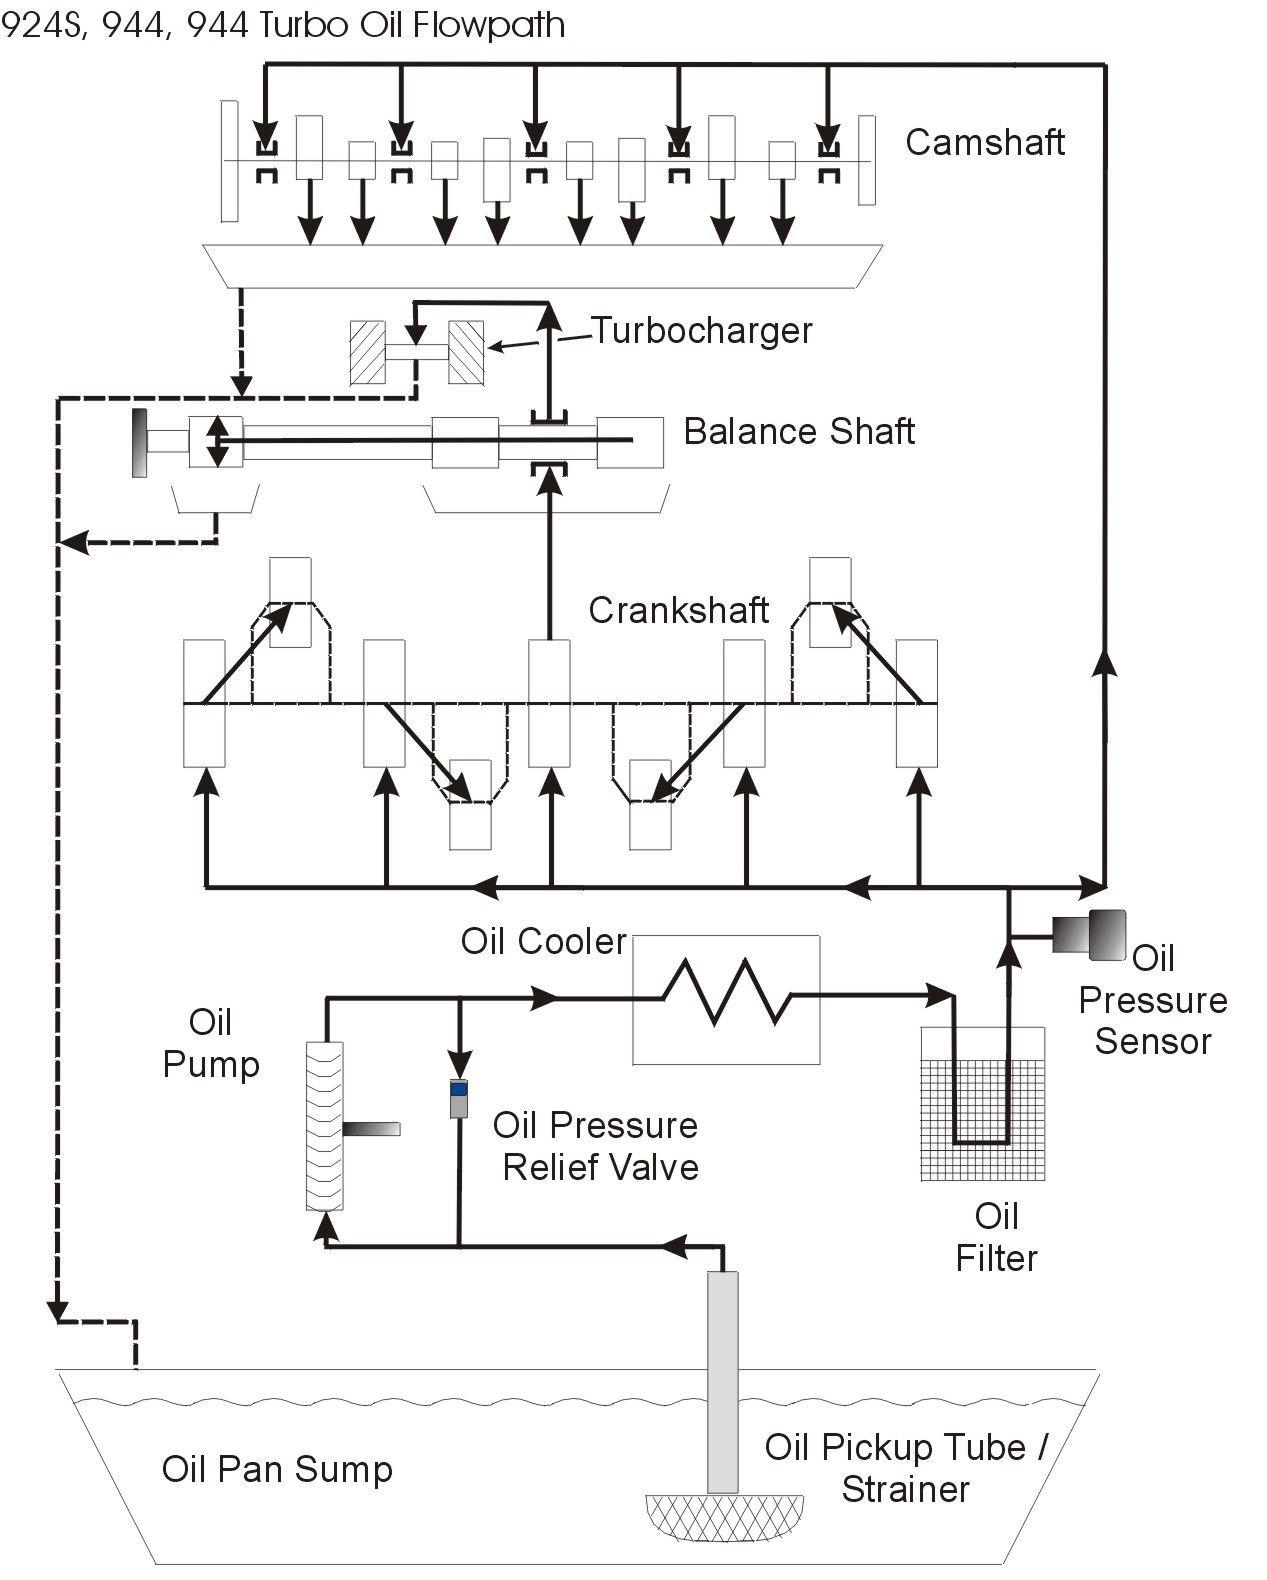 small resolution of oil flow diagram 944 porsche porsche 944 cars car engine oil flow diagram